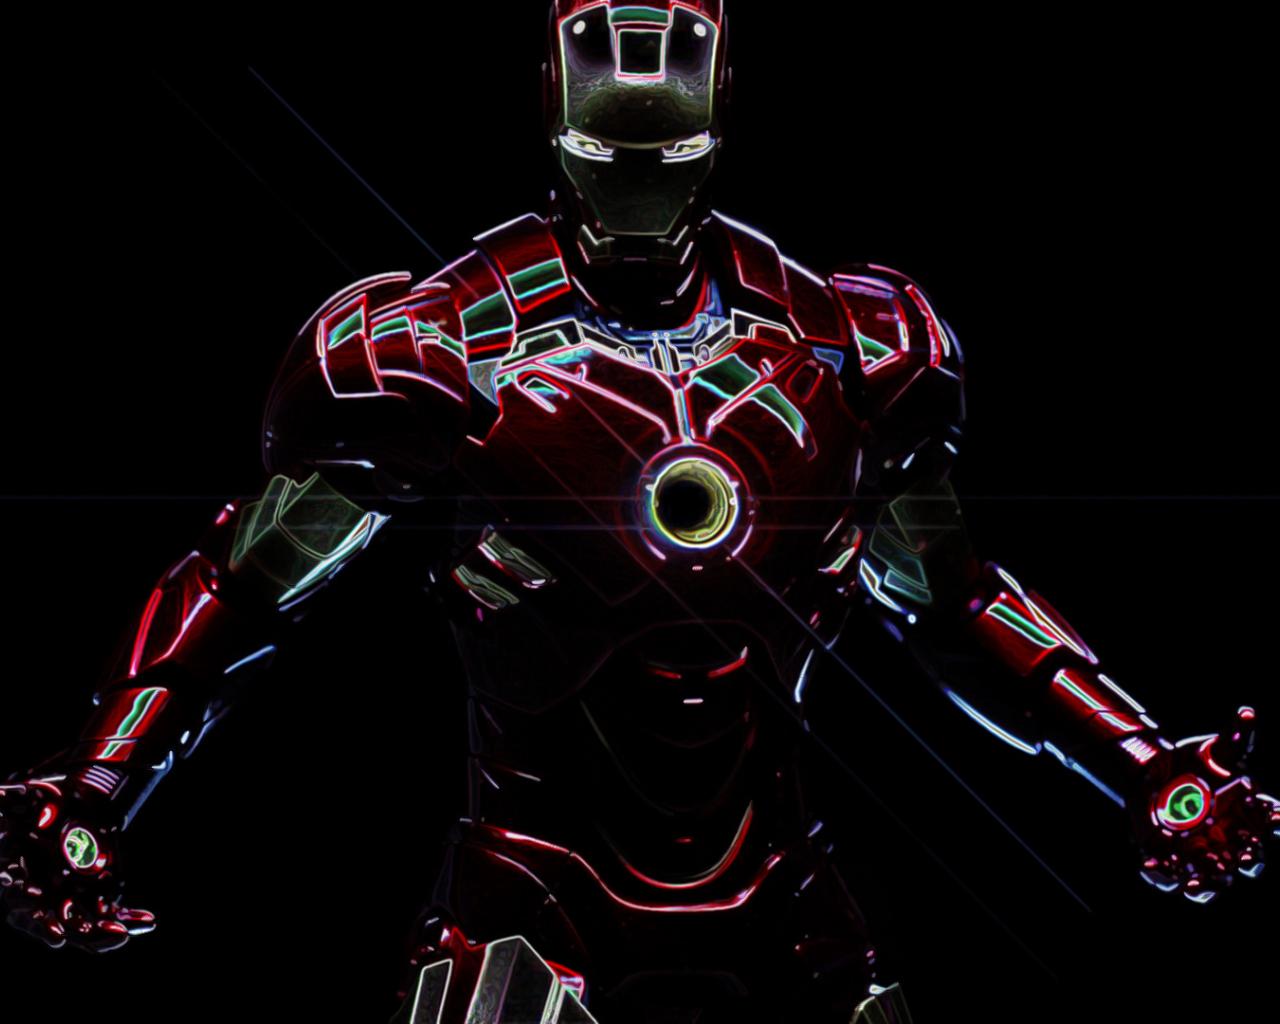 Iron Man Hd Wallpaper 1080p 142 iron man hd wallpapers backgrounds